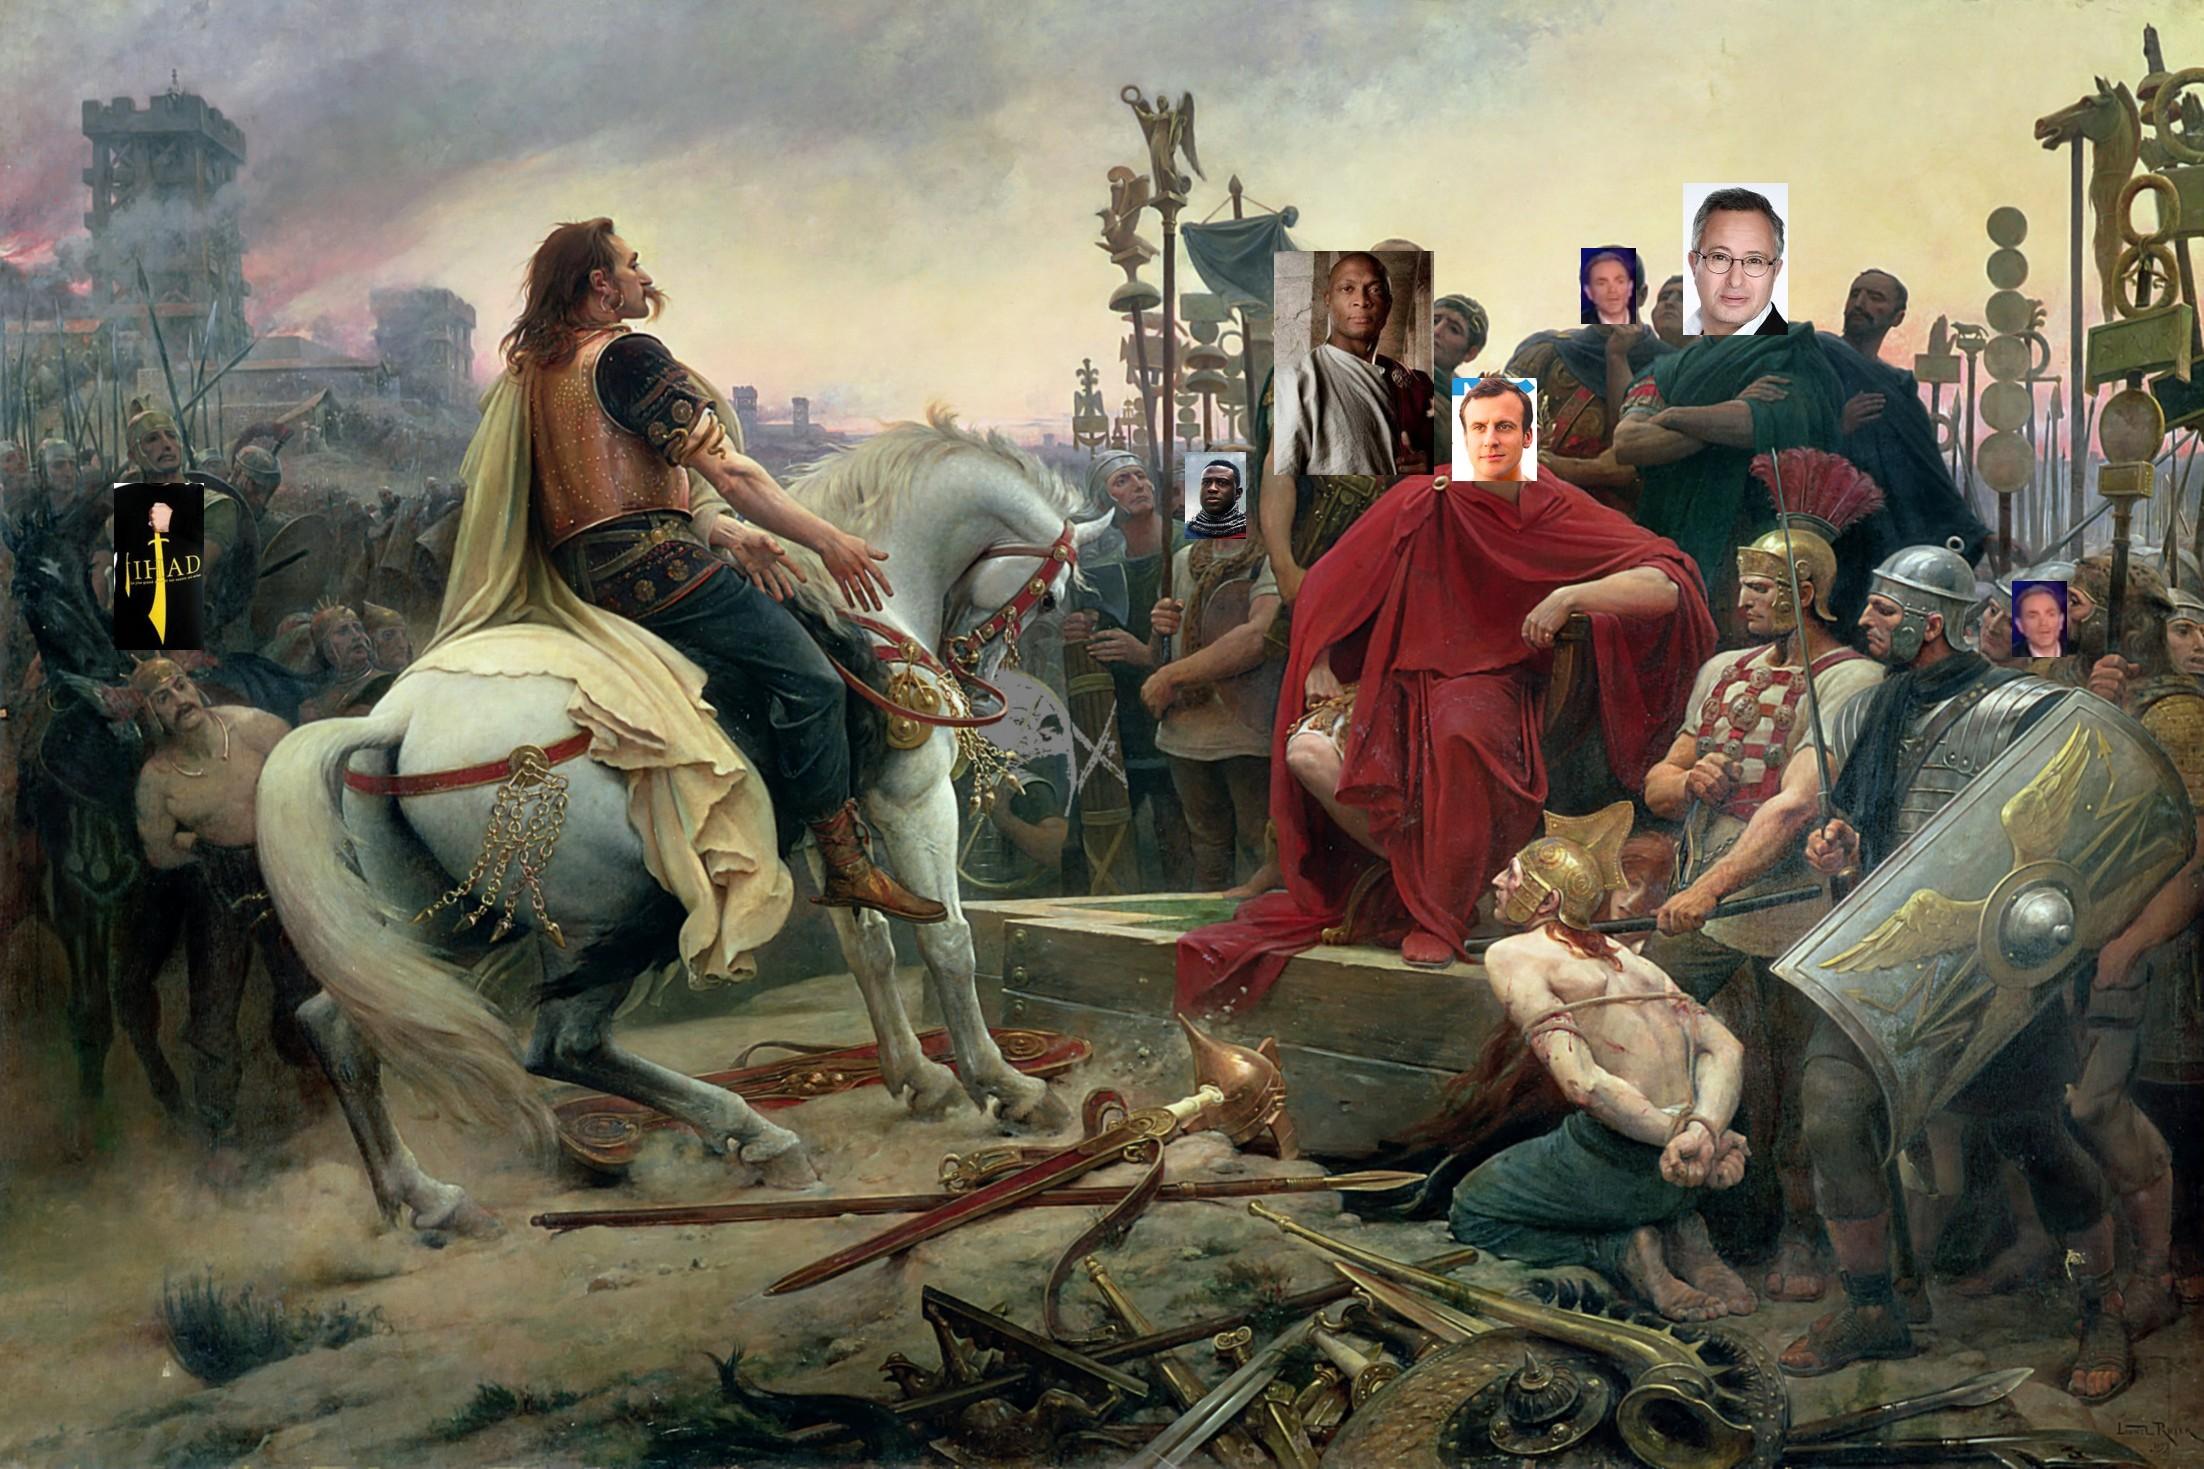 000-Patriotes-Macron-Djihad.jpg